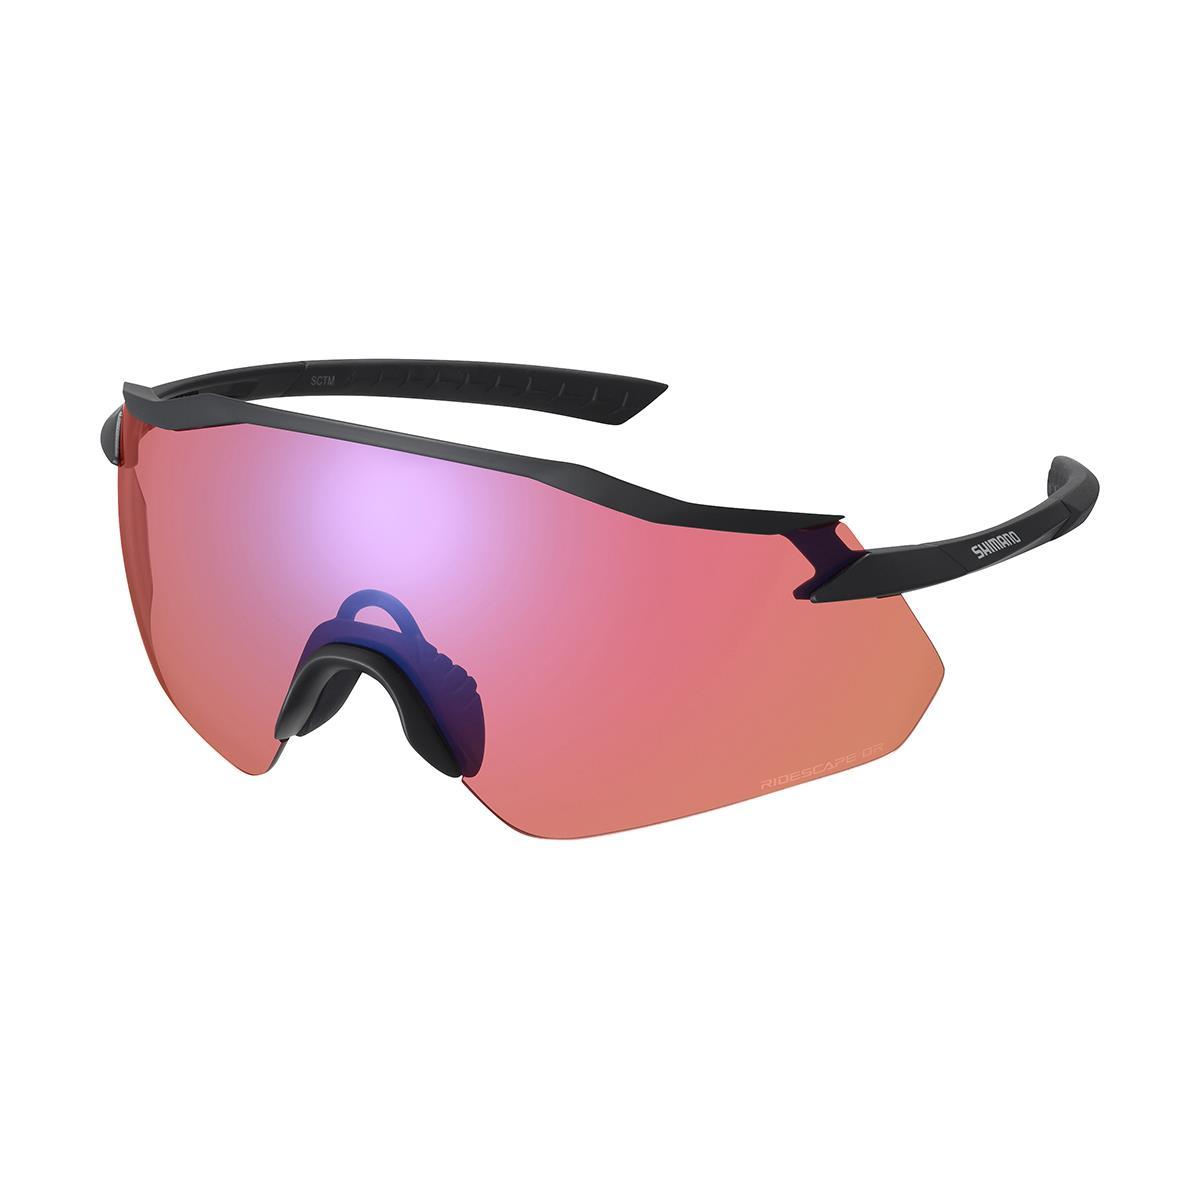 Equinox Sunglasses Black / Ridescape OR MTB Lens